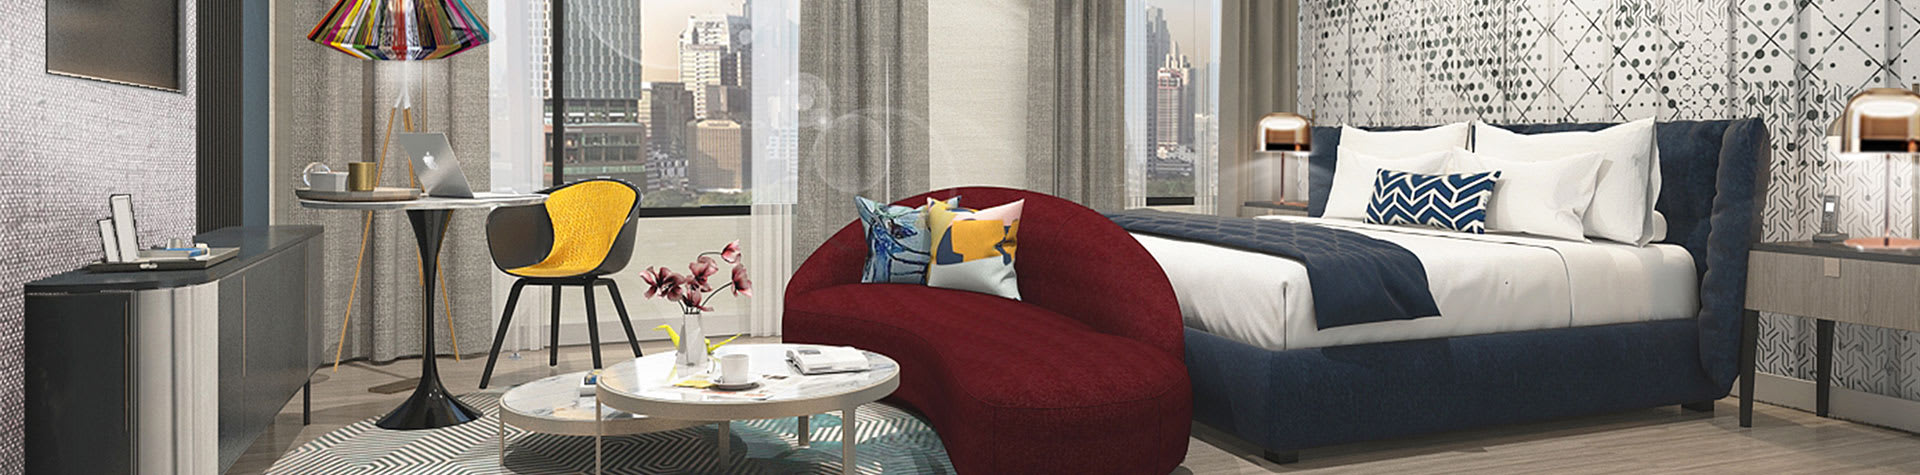 Avani Skyline Deluxe Room at Avani Sukhumvit Bangkok Hotel